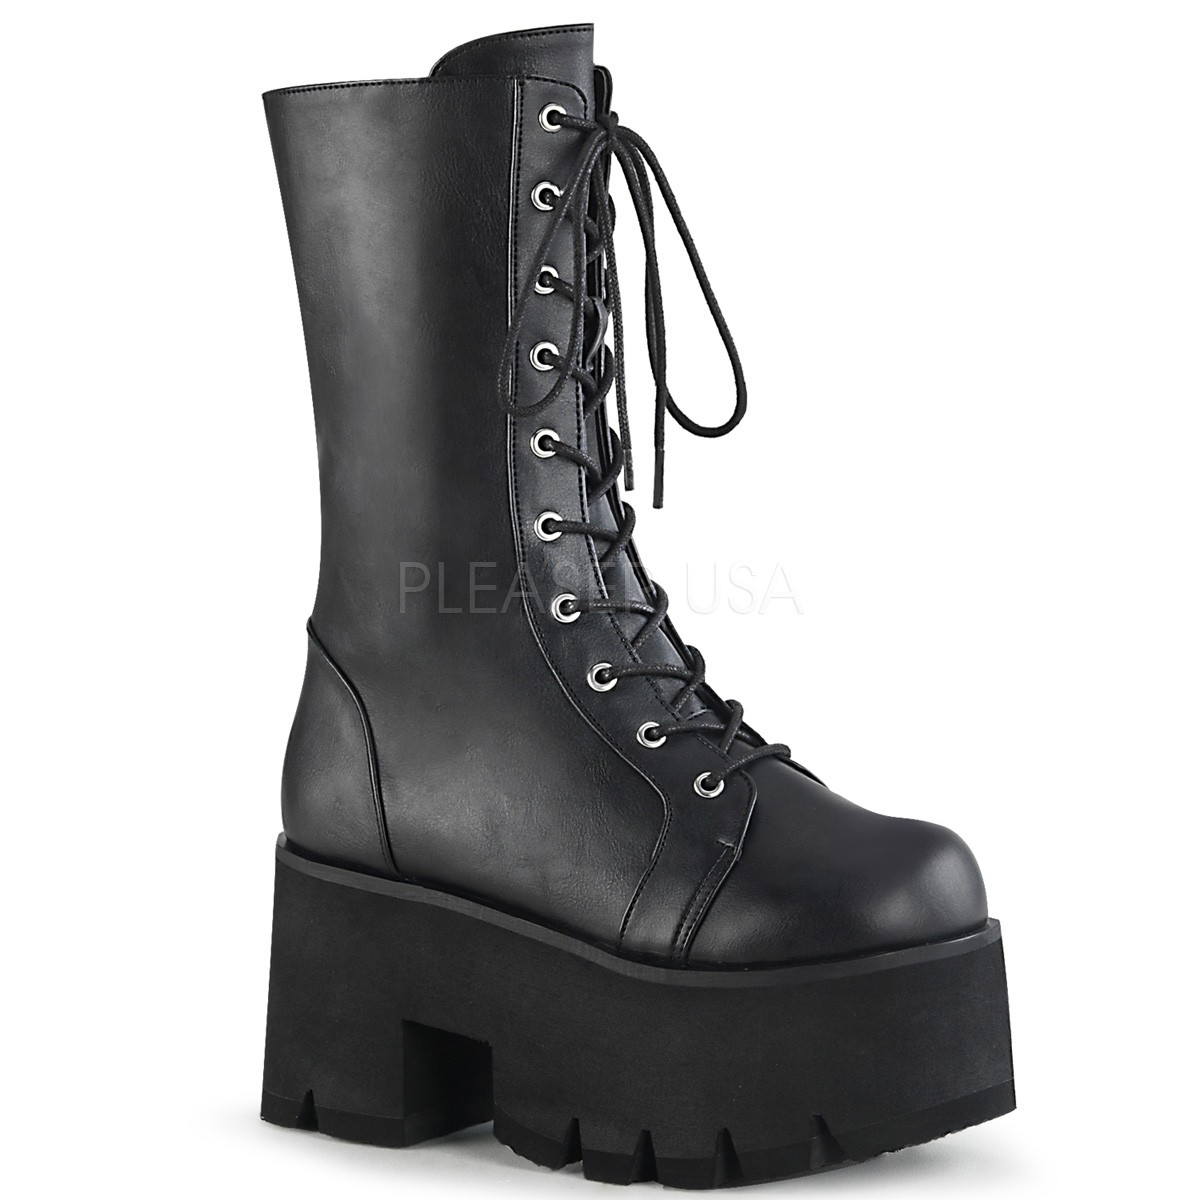 bd637991608f Vegan-9-cm-Demonia-ASHES-105-goth-platform-boots-11665 0.jpg